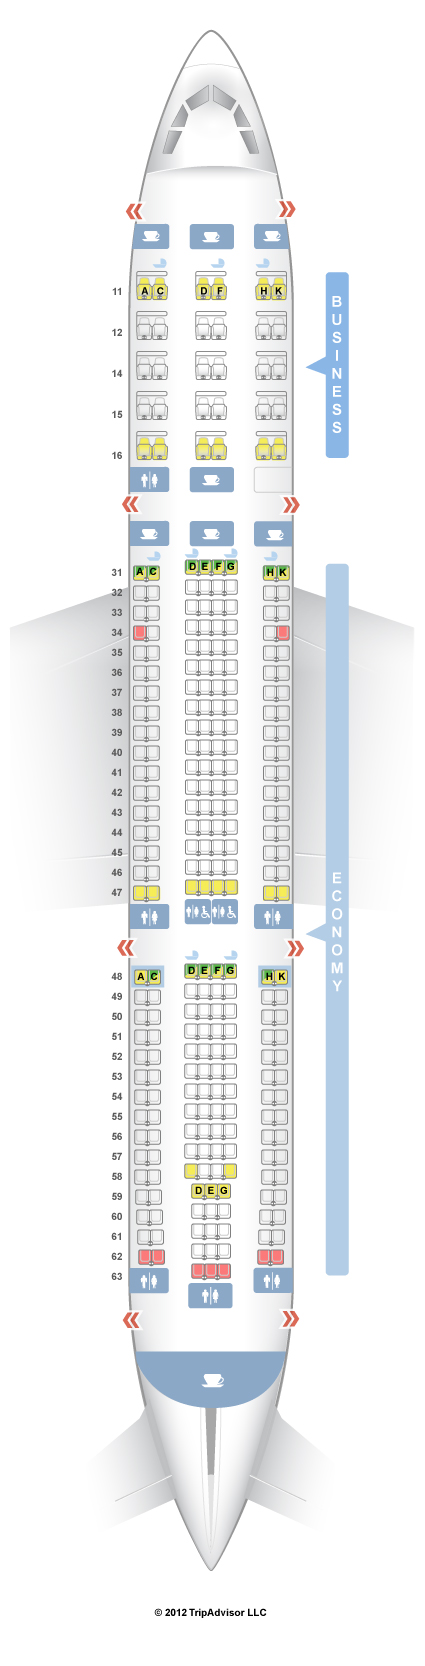 SeatGuru Seat Map Singapore Airlines Airbus A330-300 (333)